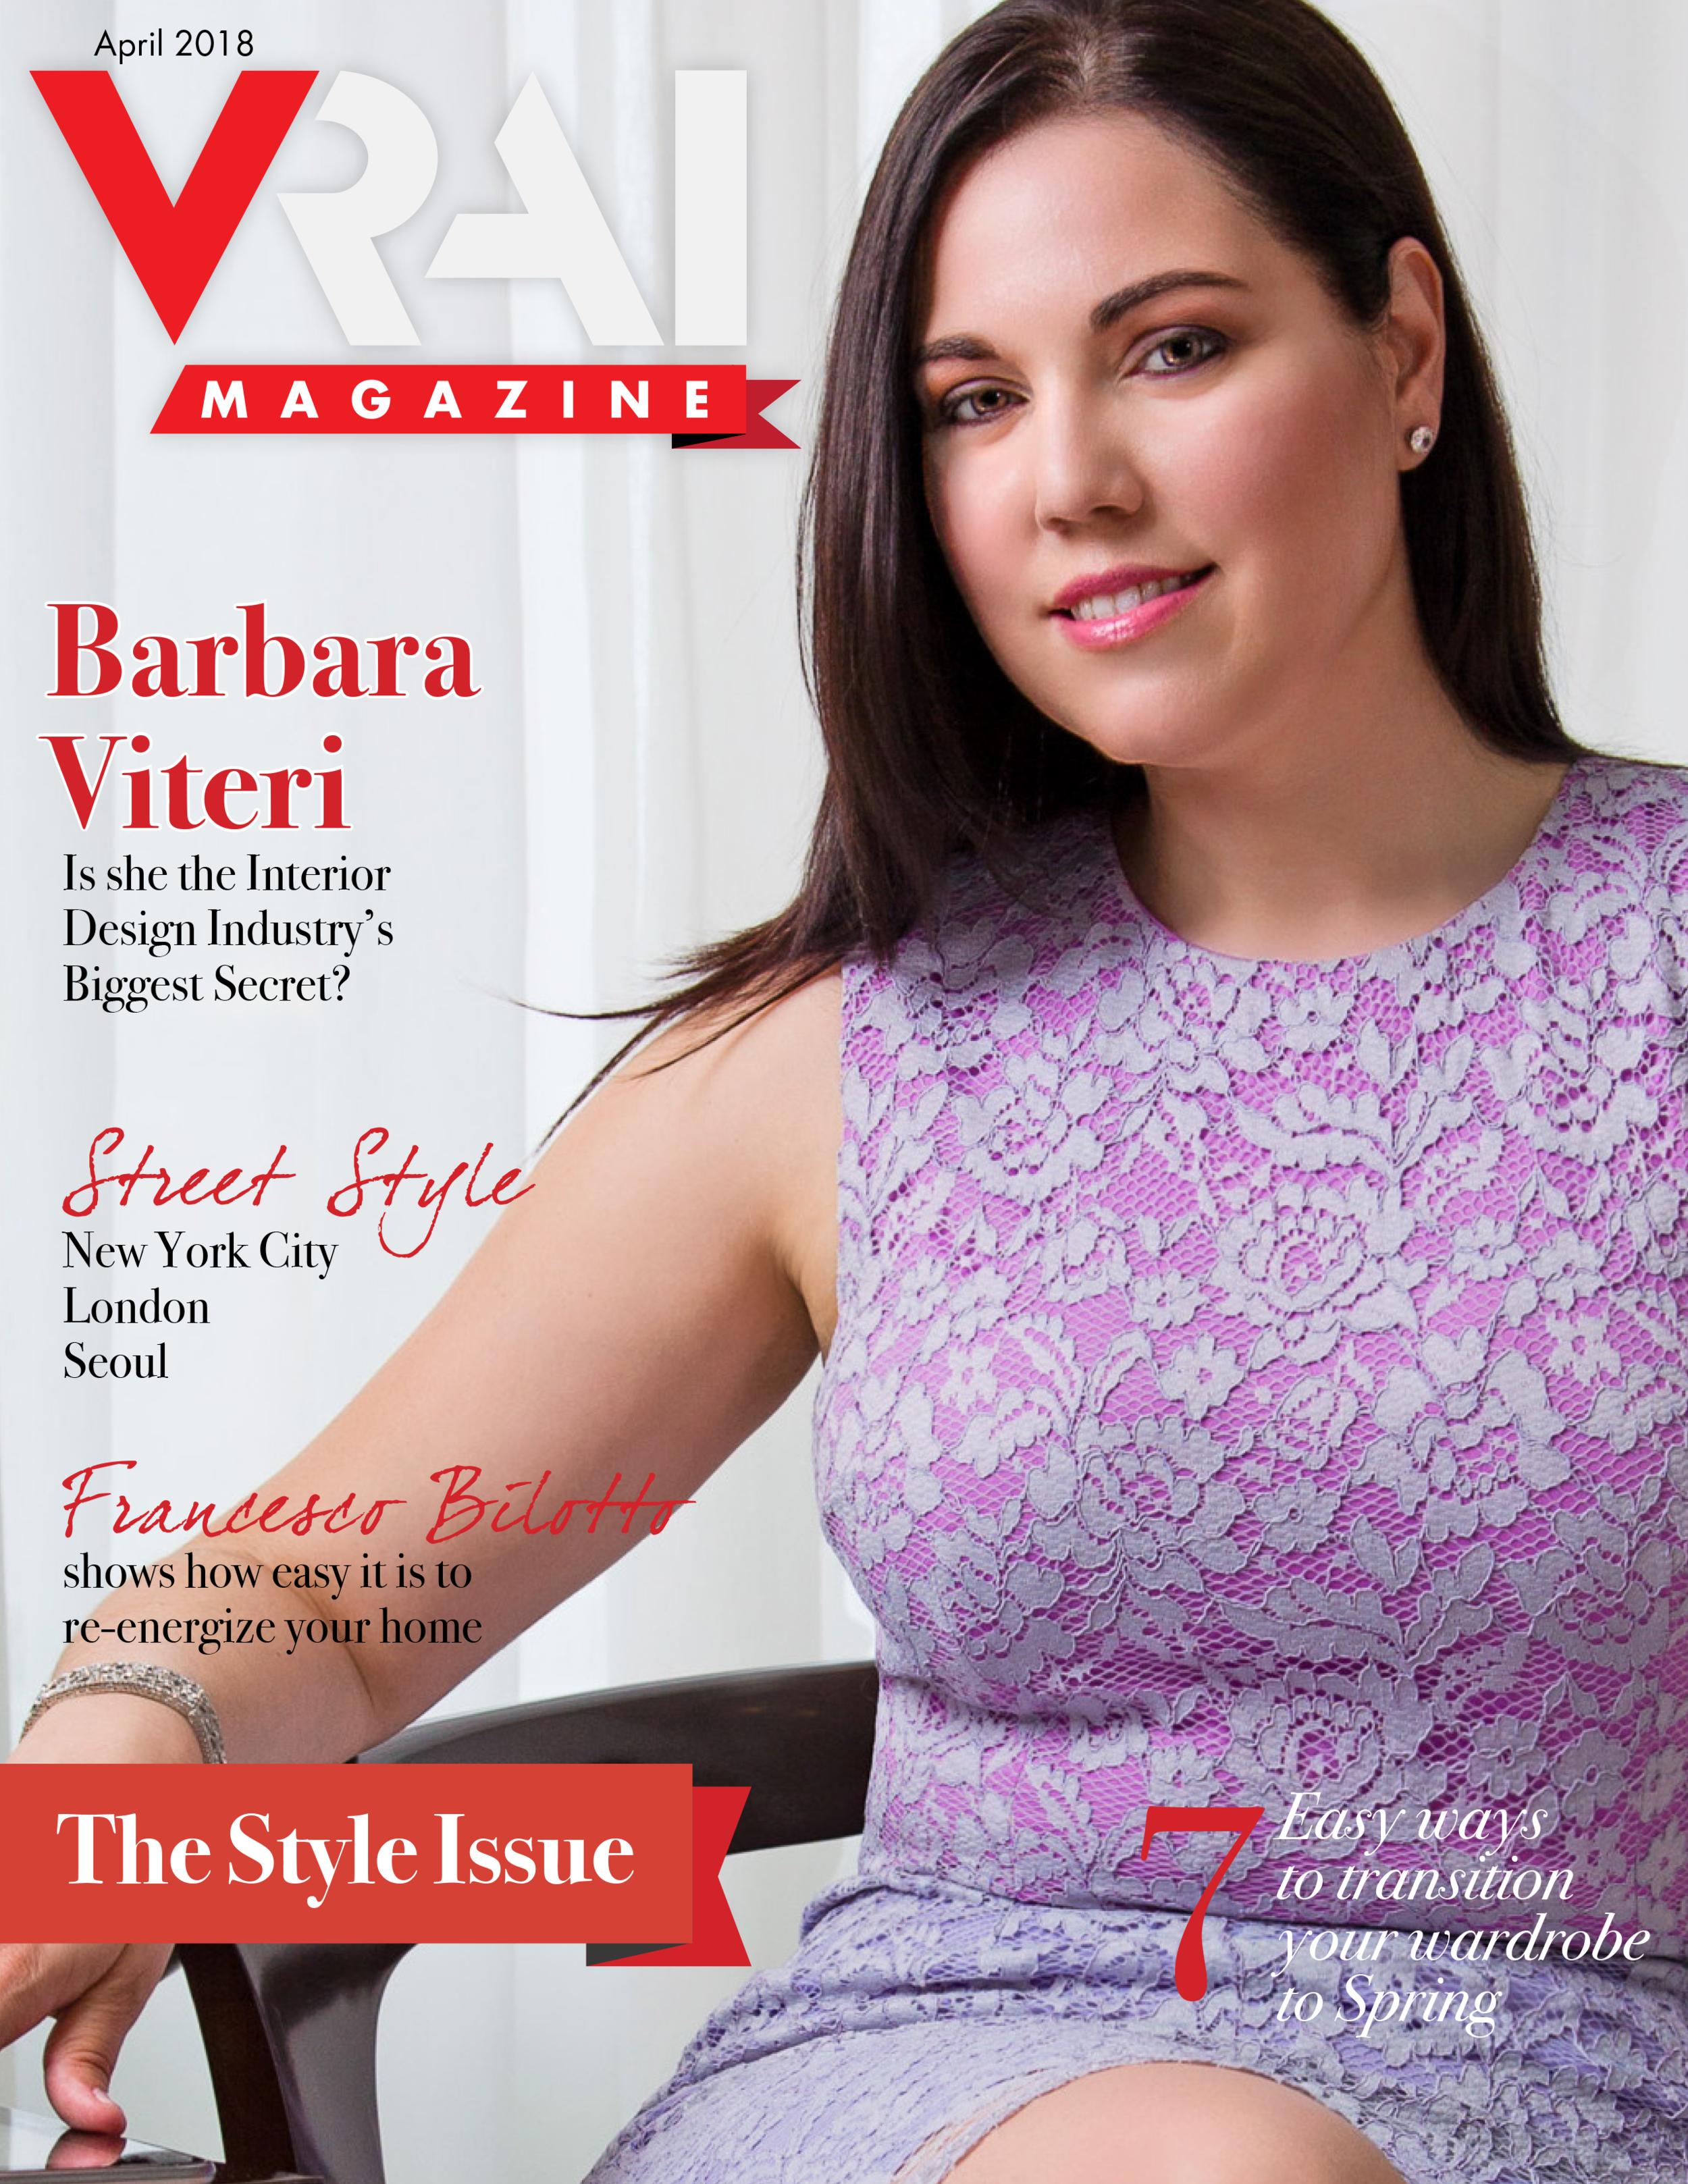 VRAI Magazine Spring Style Issue April 2018 - Barbara Viteri-1.png